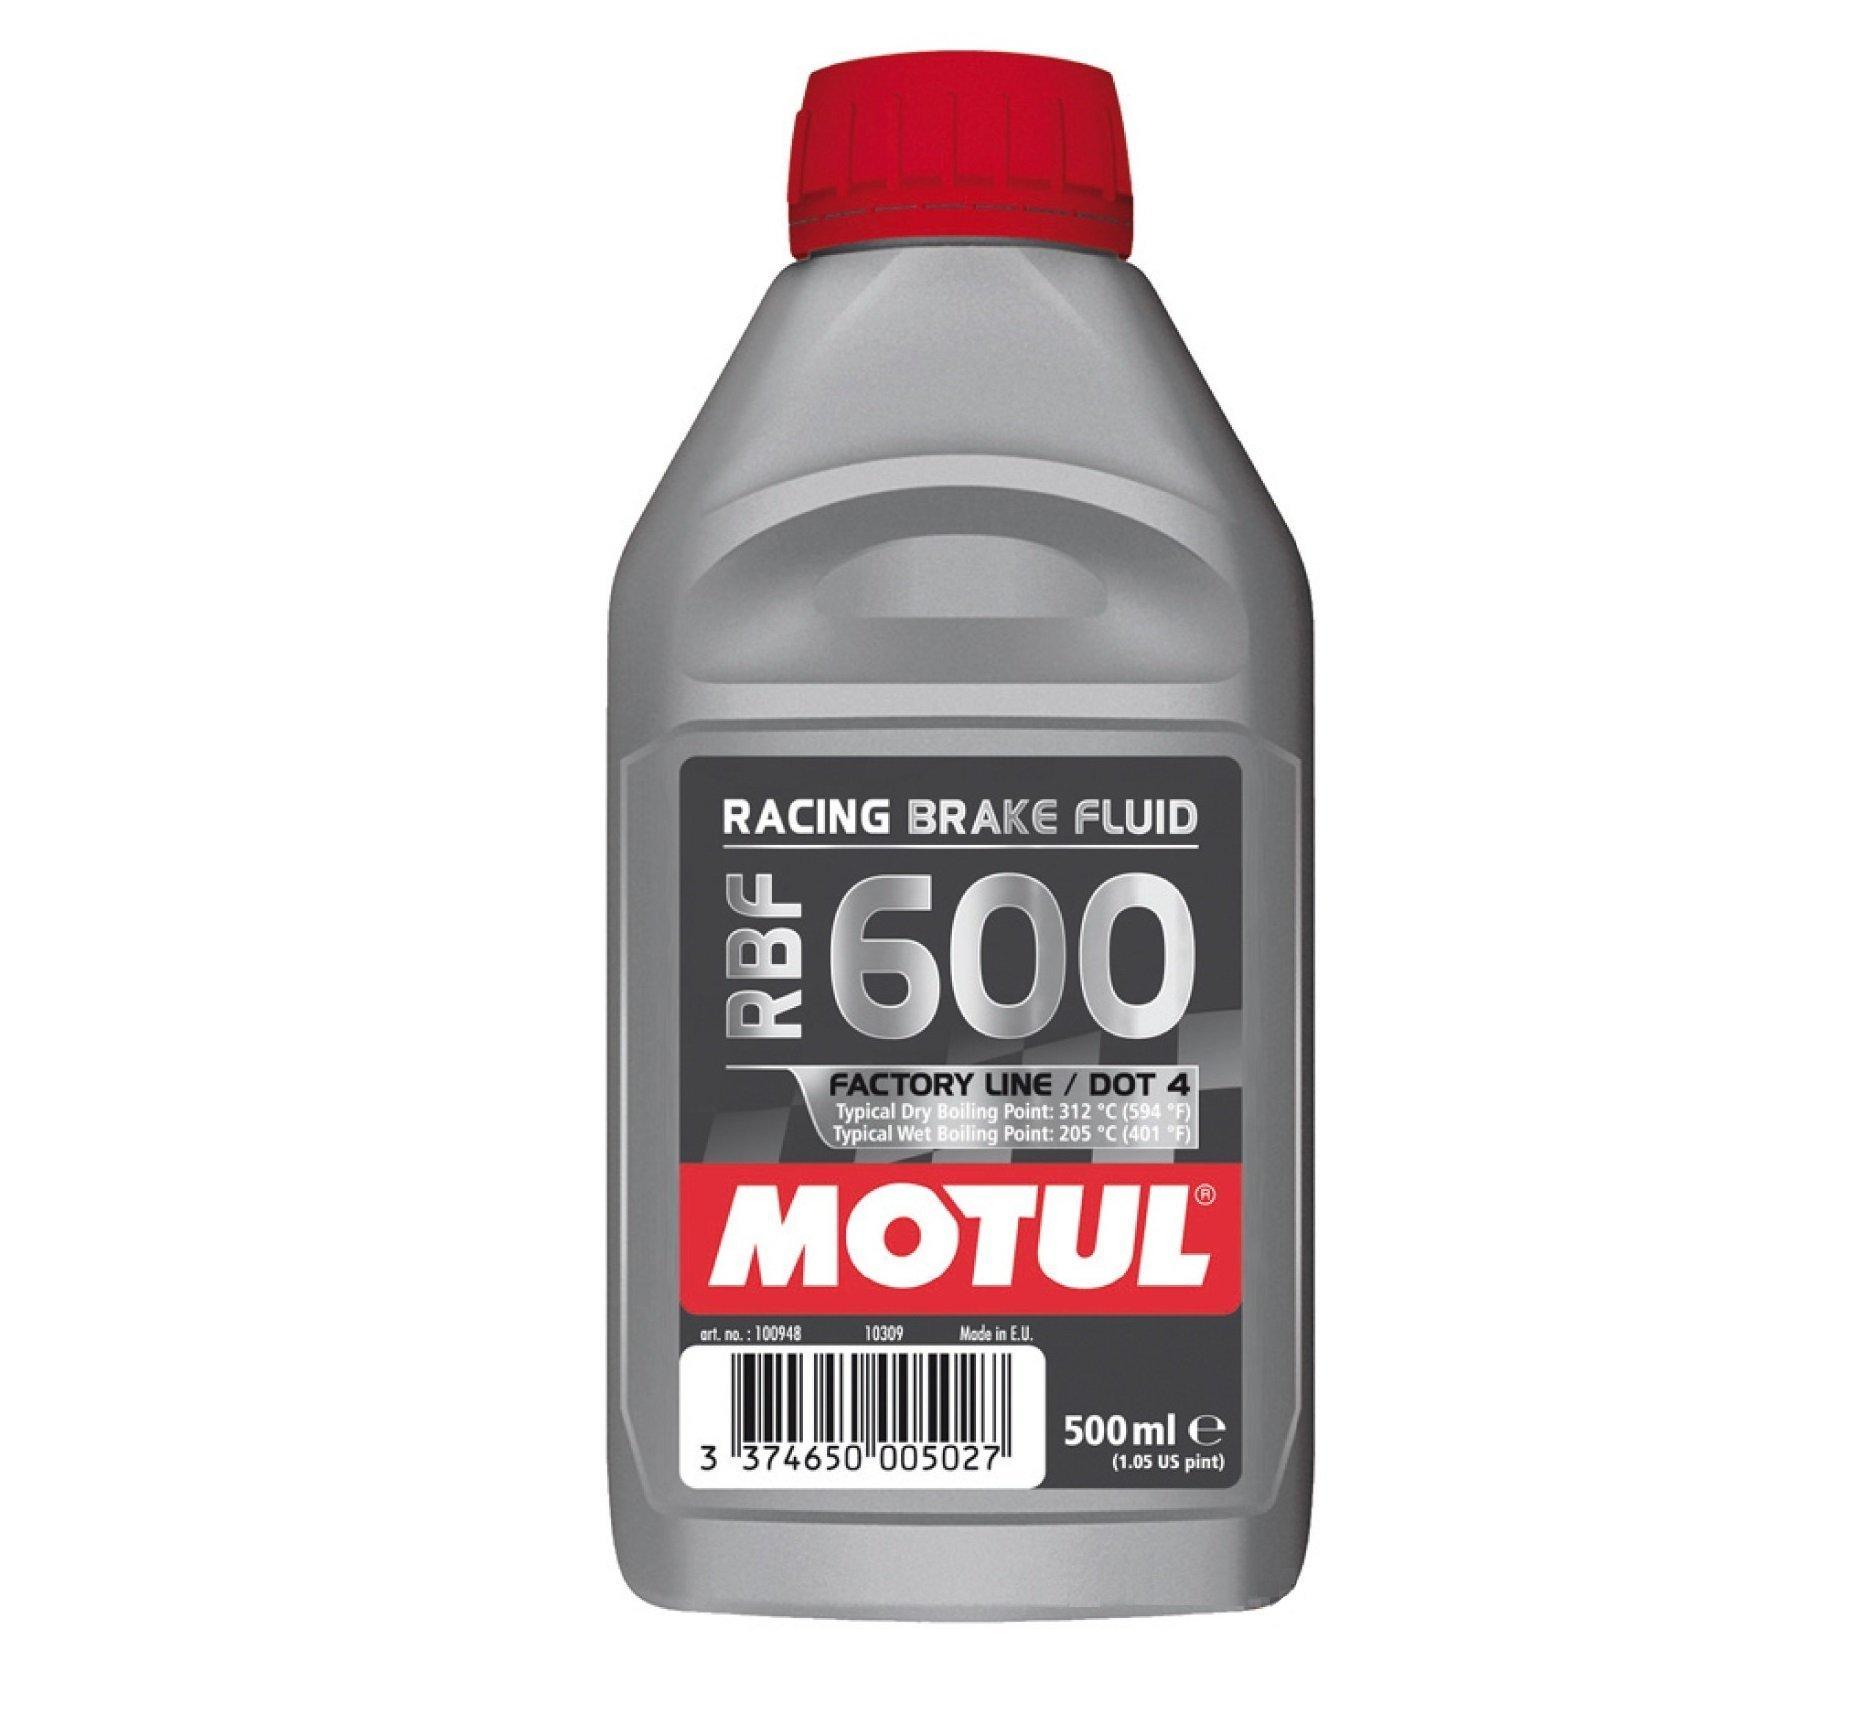 MOTUL RACING BRAKE FLUID RBF600 DOT4 500МЛ